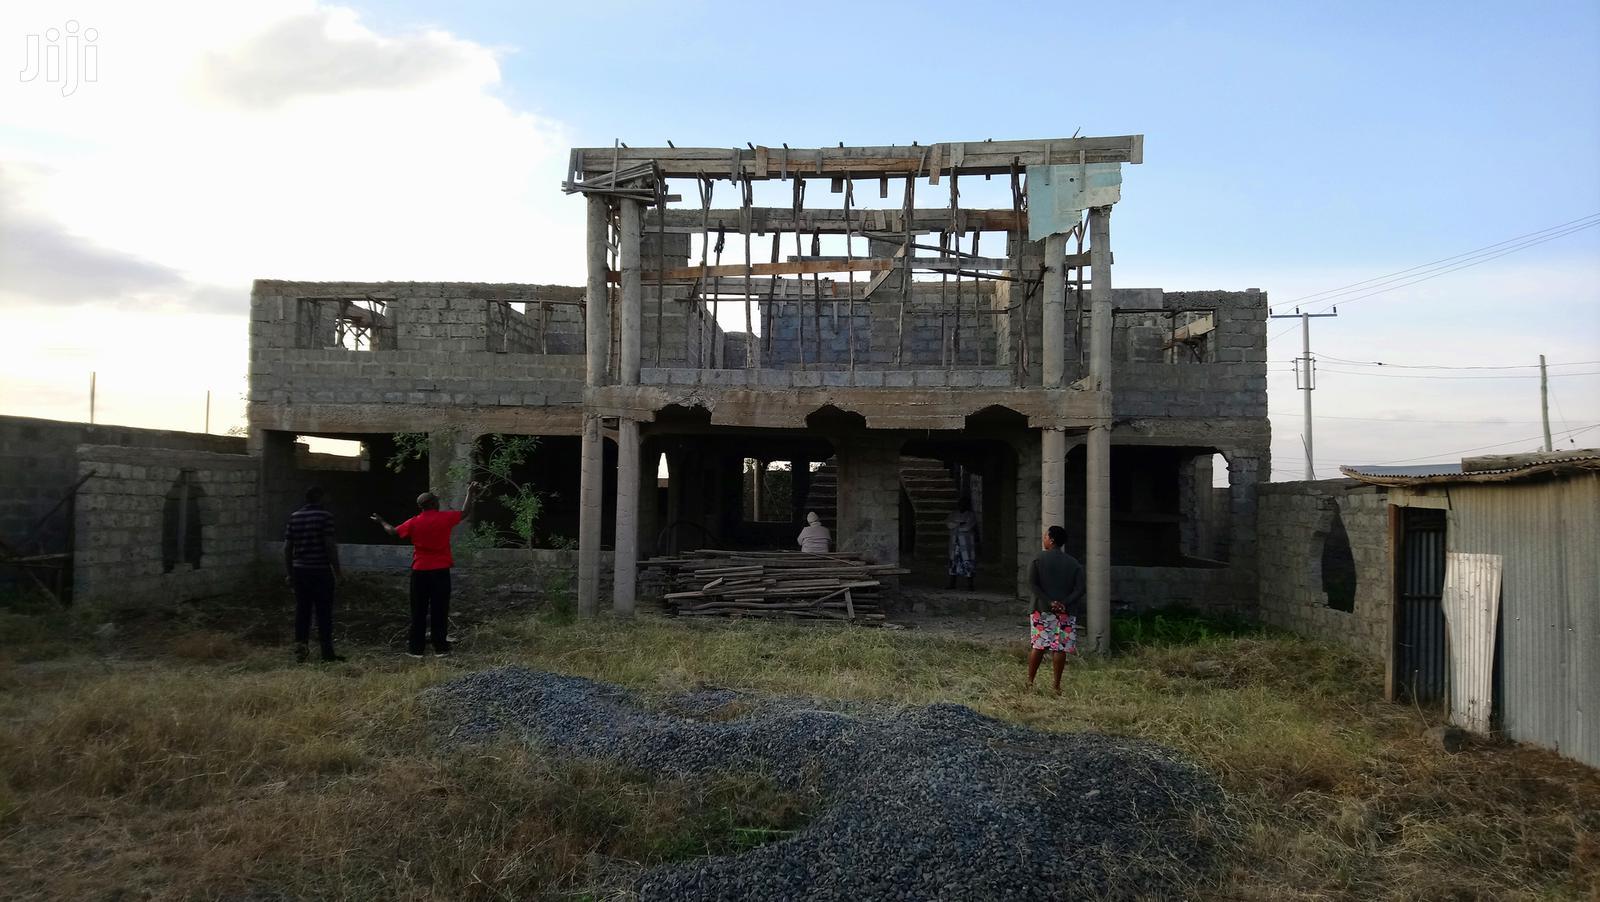 Archive 50 Complete House On A Quarter Acre Corner Plot Chuna Kitengela In Kitengela Land Plots For Sale Sami Gathii Jiji Co Ke For Sale In Kitengela Buy Land